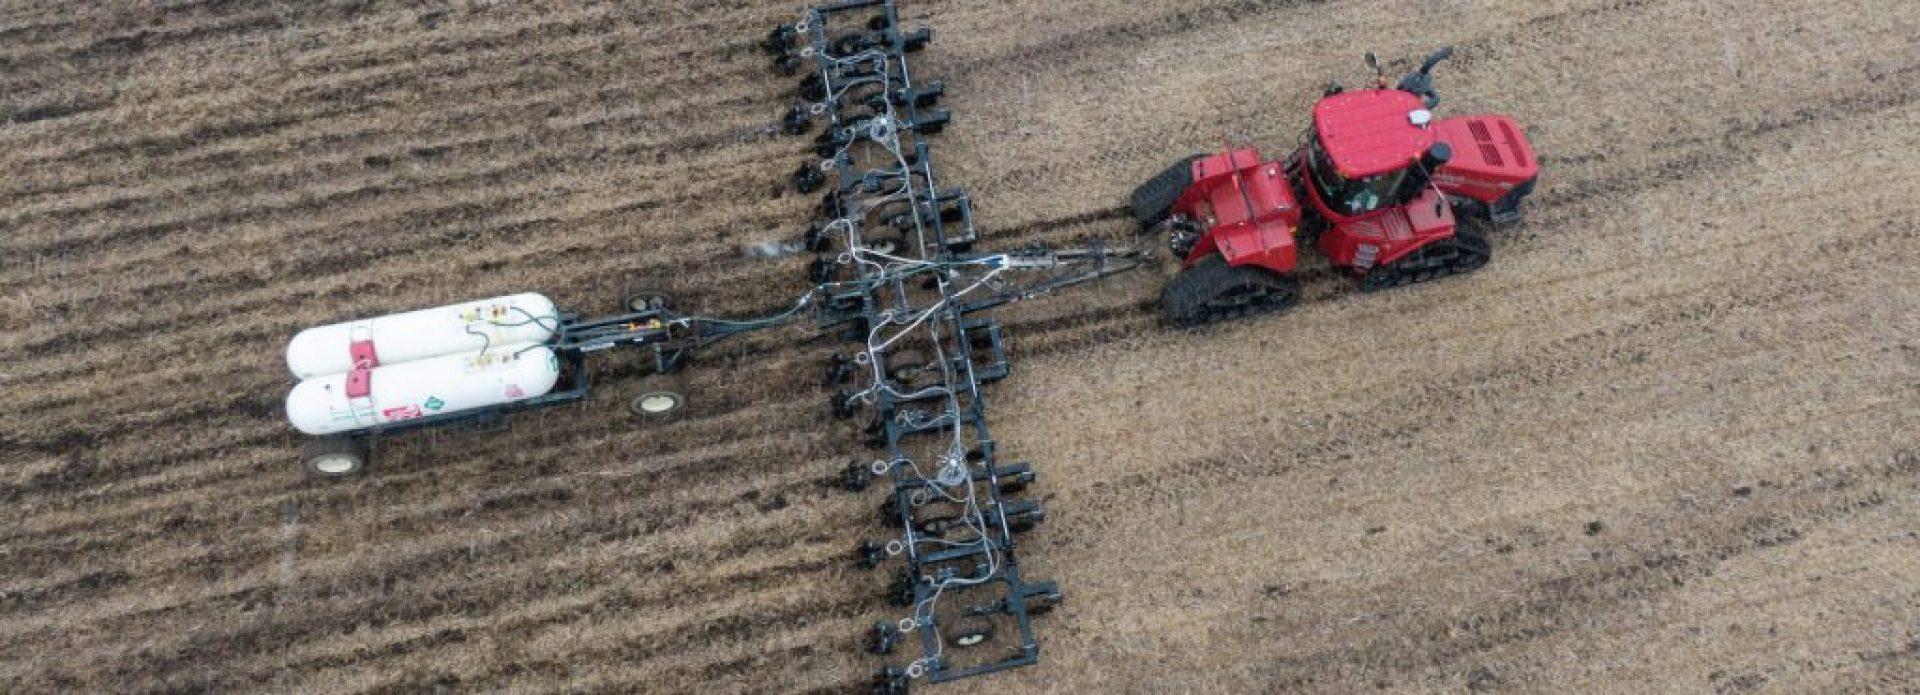 Eldon-C-Stutsman-Inc-Agronomy-Fall-5